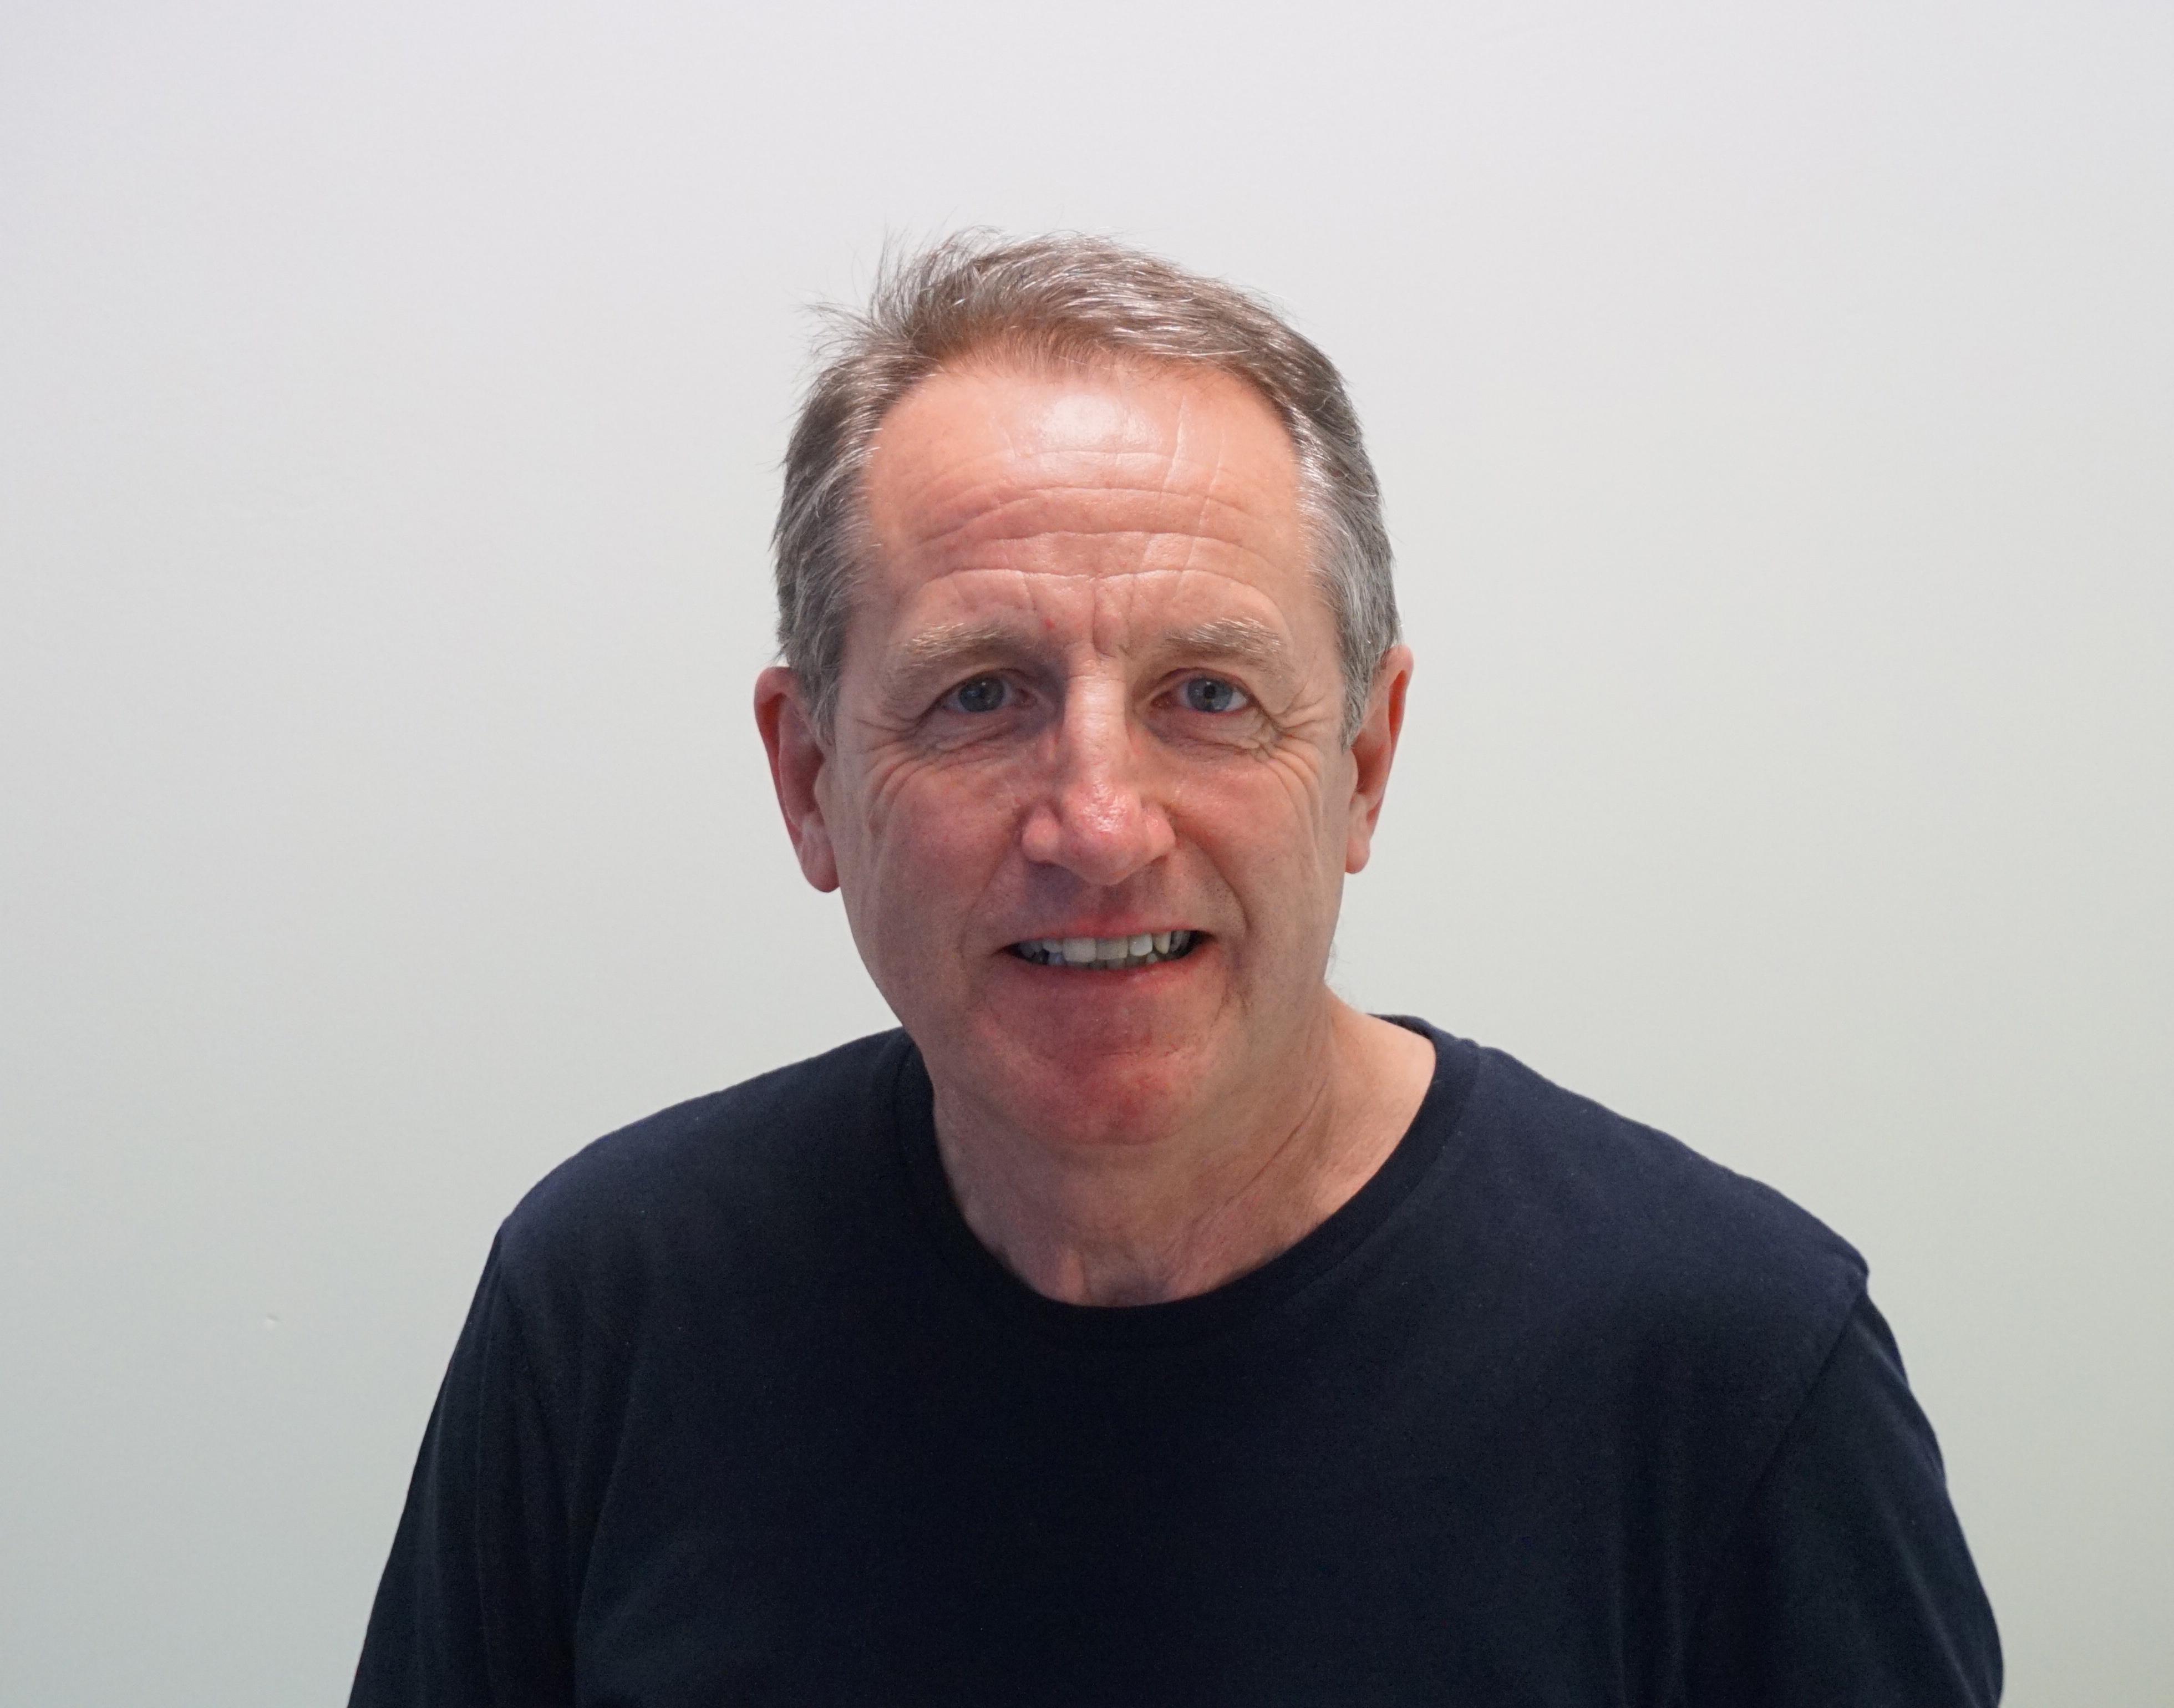 Geoff Baty